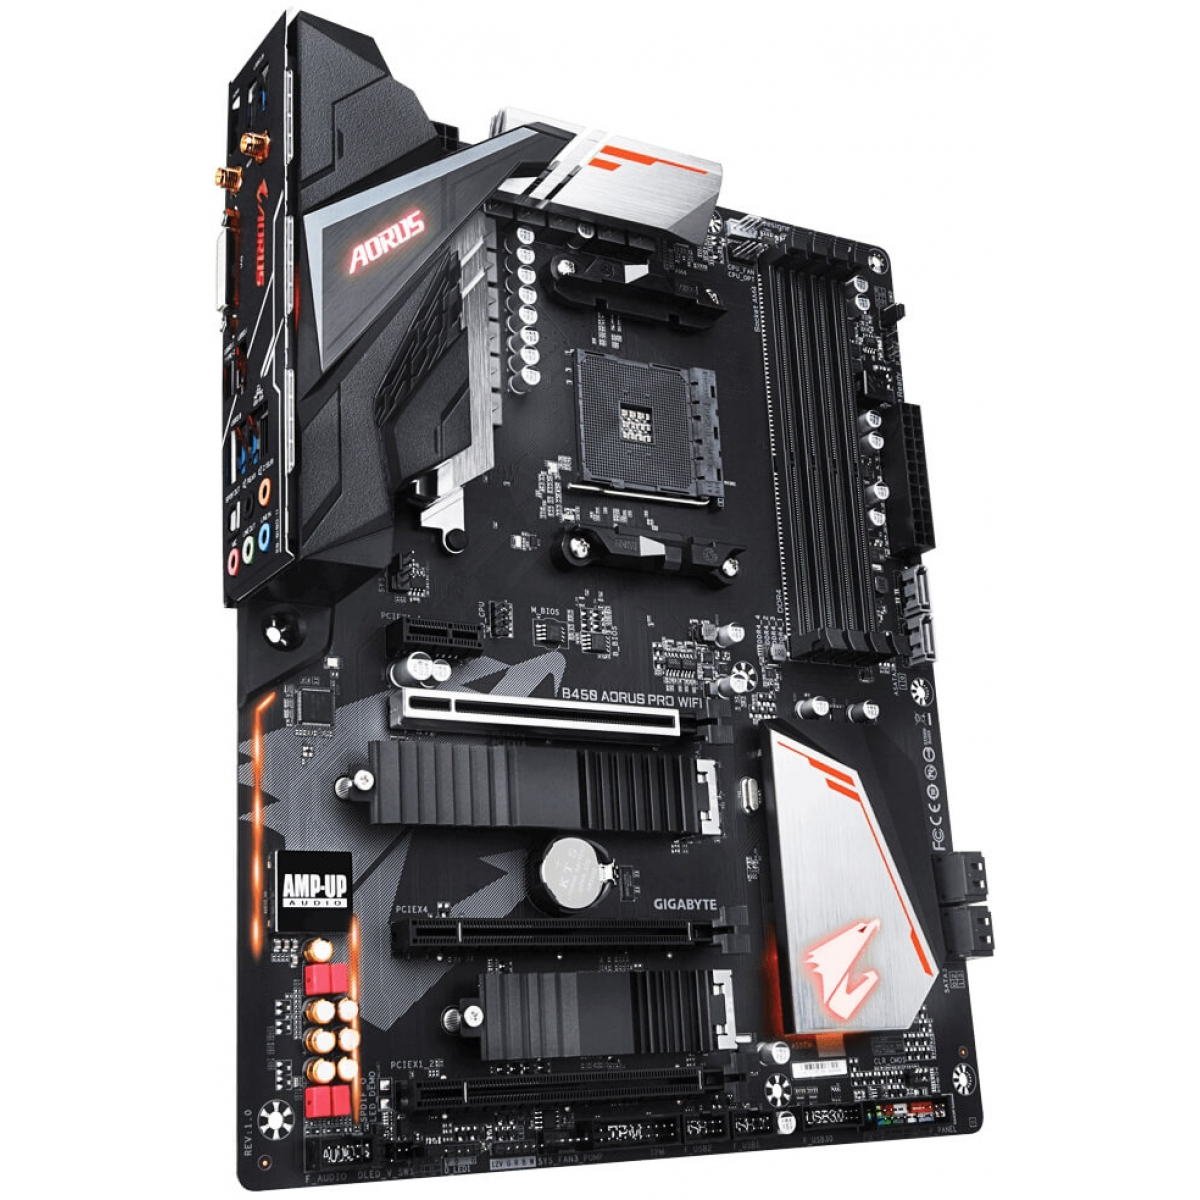 Placa Mãe Gigabyte B450 AORUS PRO WIFI, Chipset B450, AMD AM4, ATX, DDR4